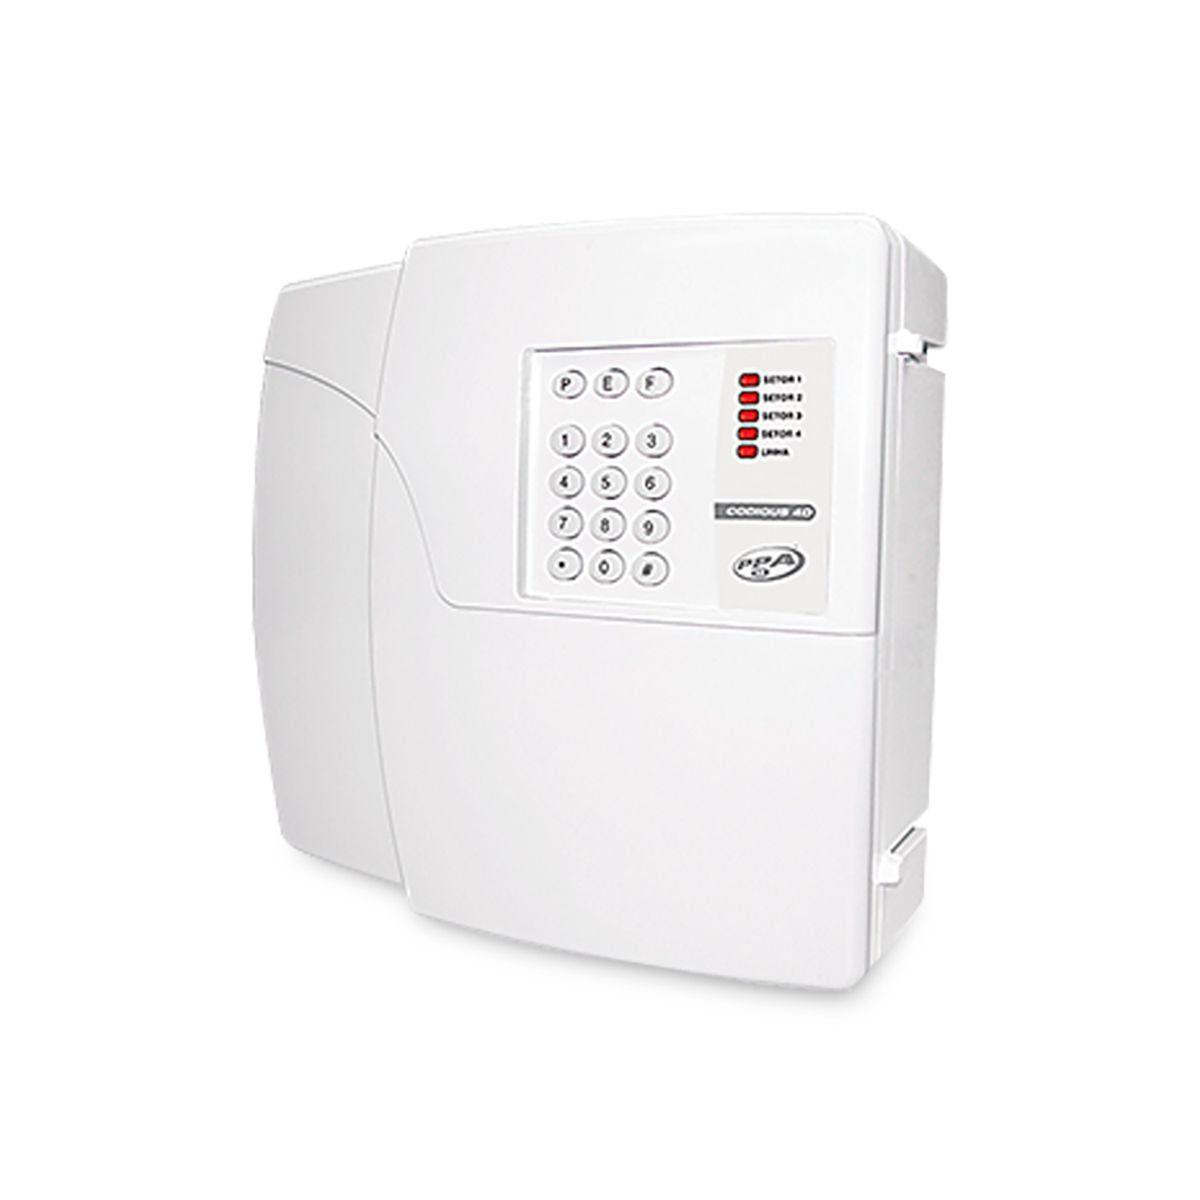 Kit Alarme Residencial PPA 12 Sensores Sem Fio Discadora